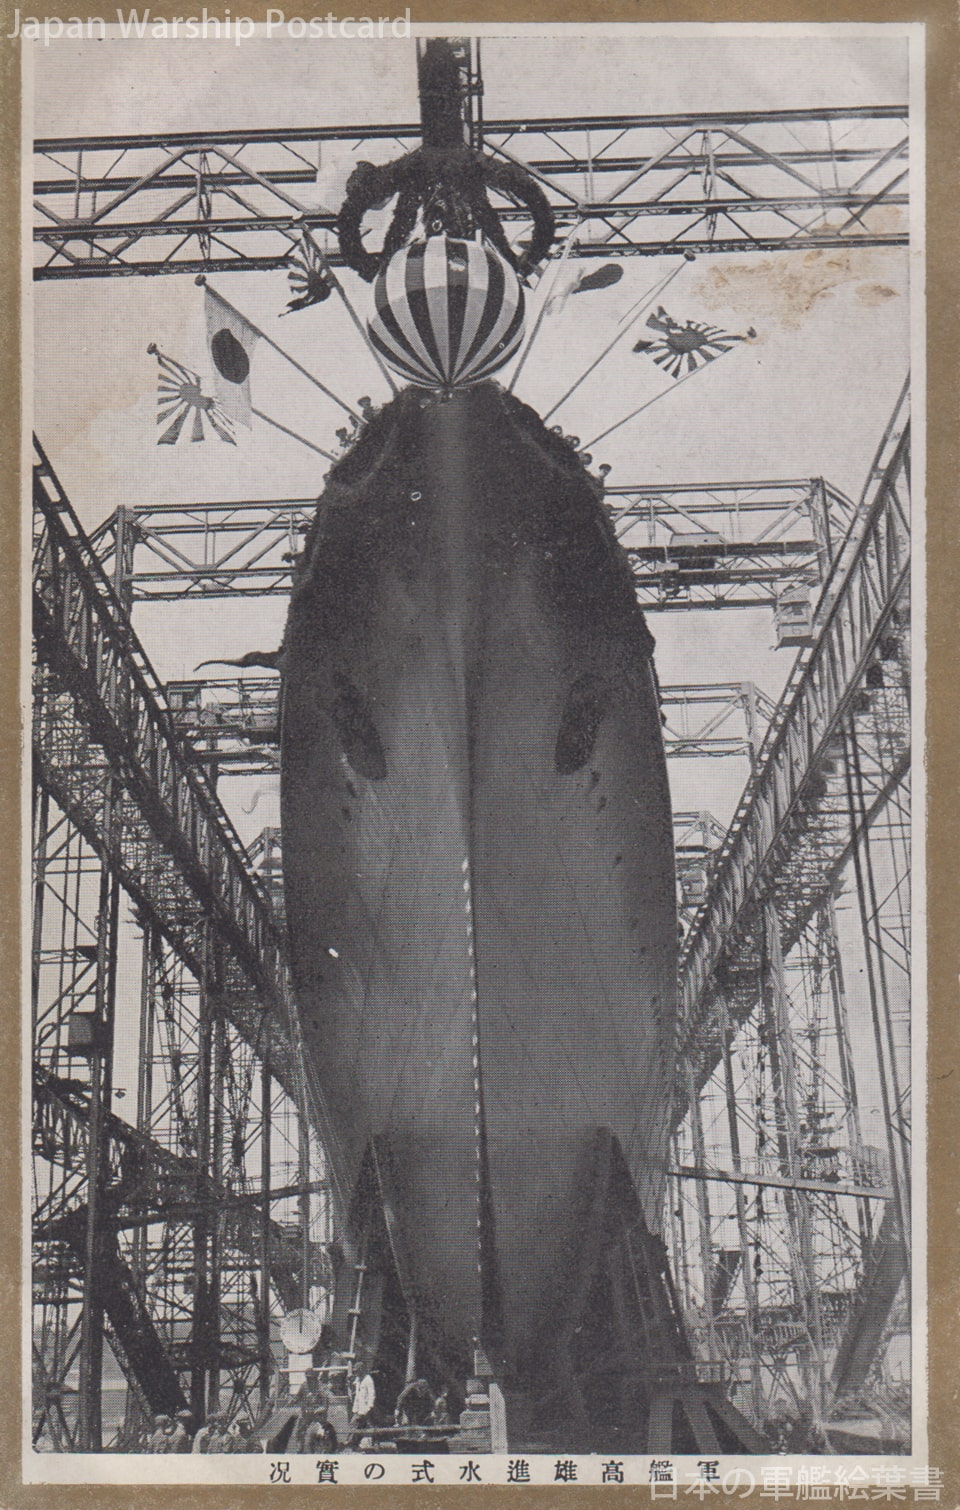 軍艦高雄進水式の実況